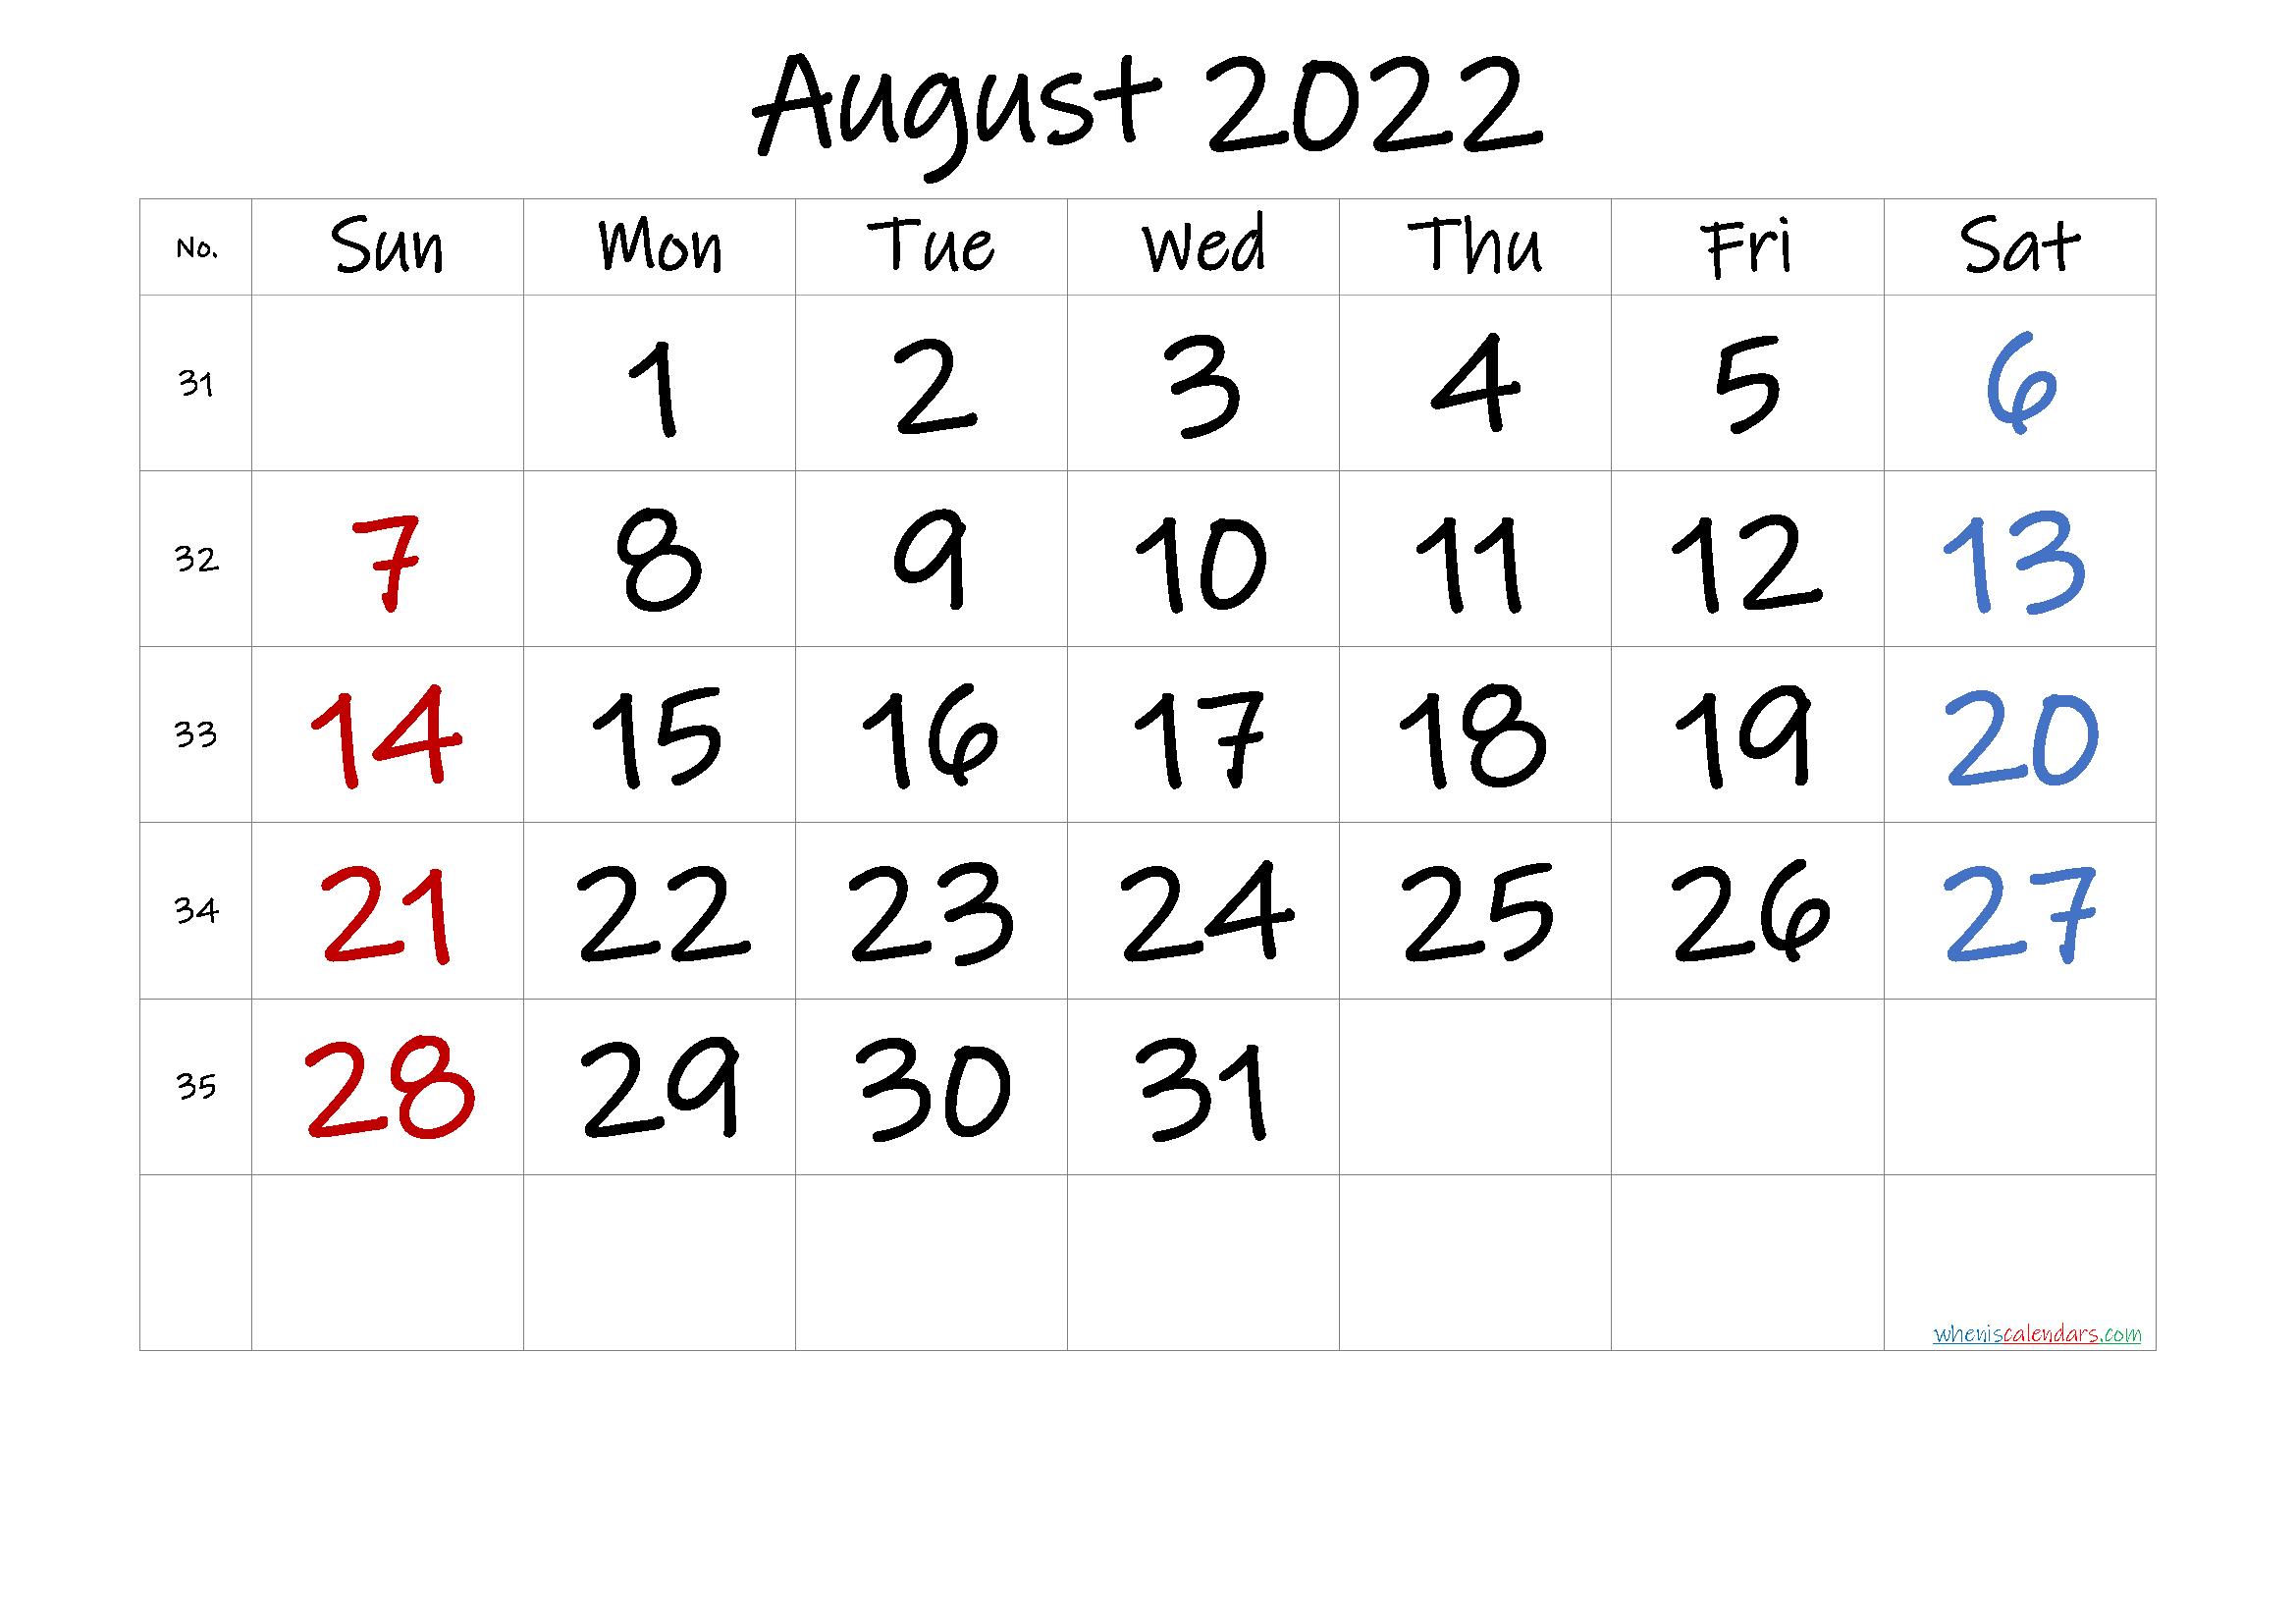 August 2022 Printable Calendar With Holidays - 6 Templates